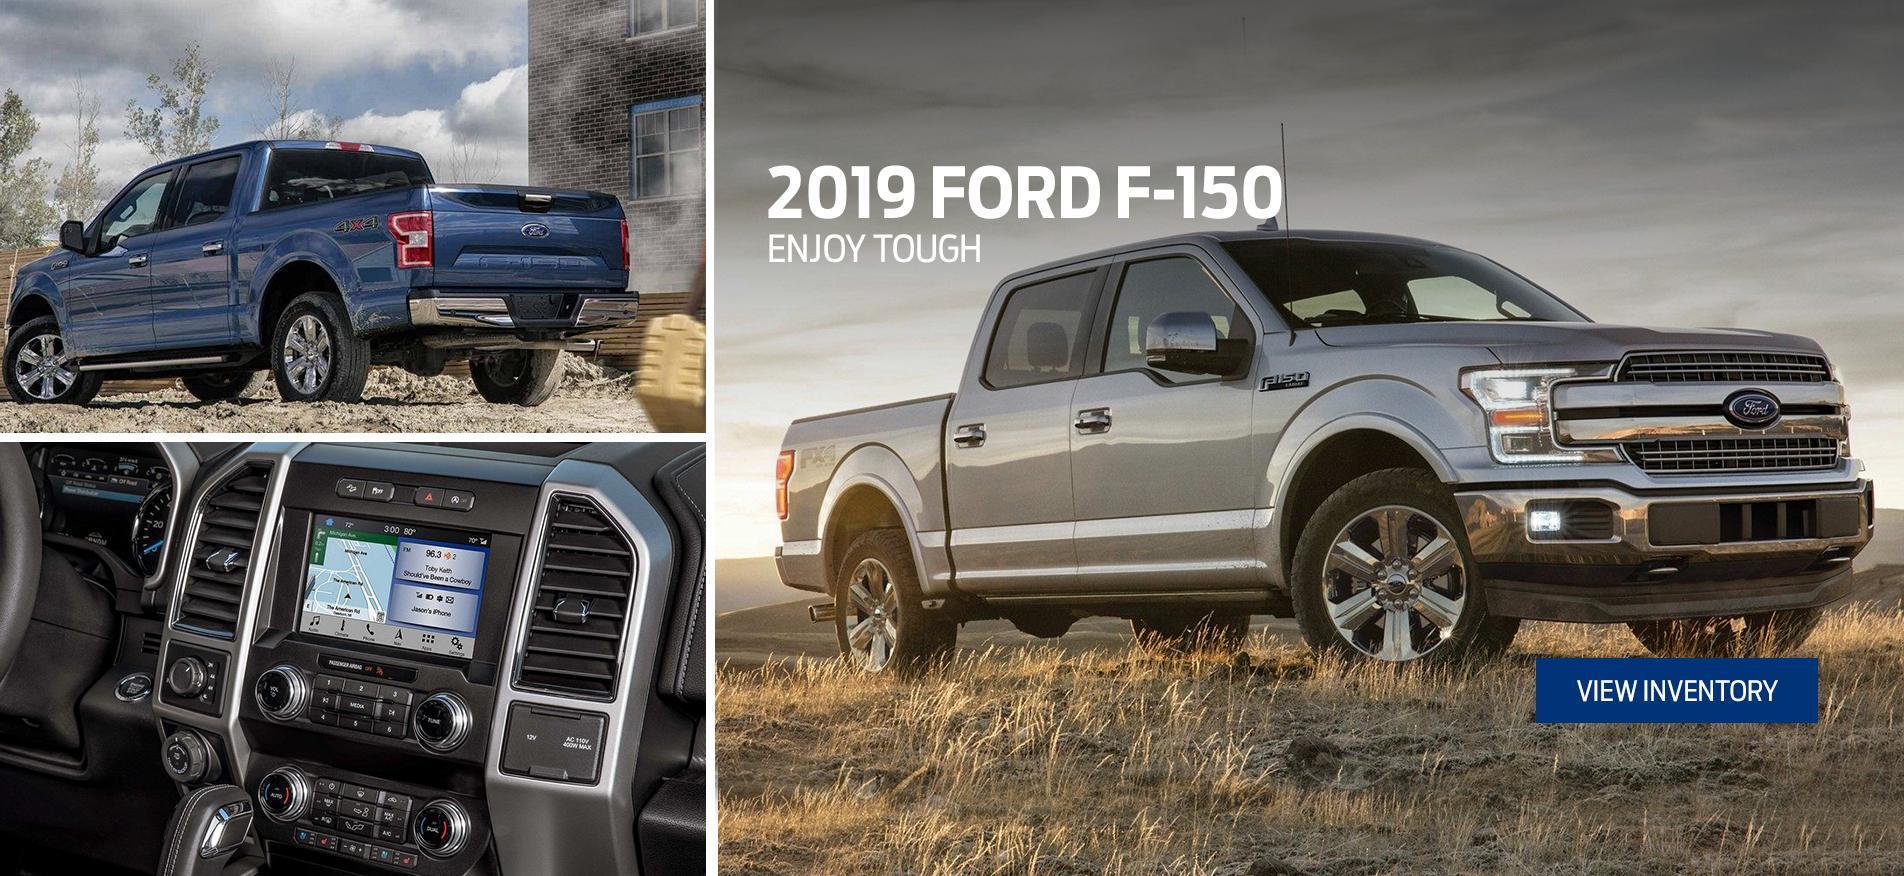 2019 F-150 Kamloops Dearborn Ford